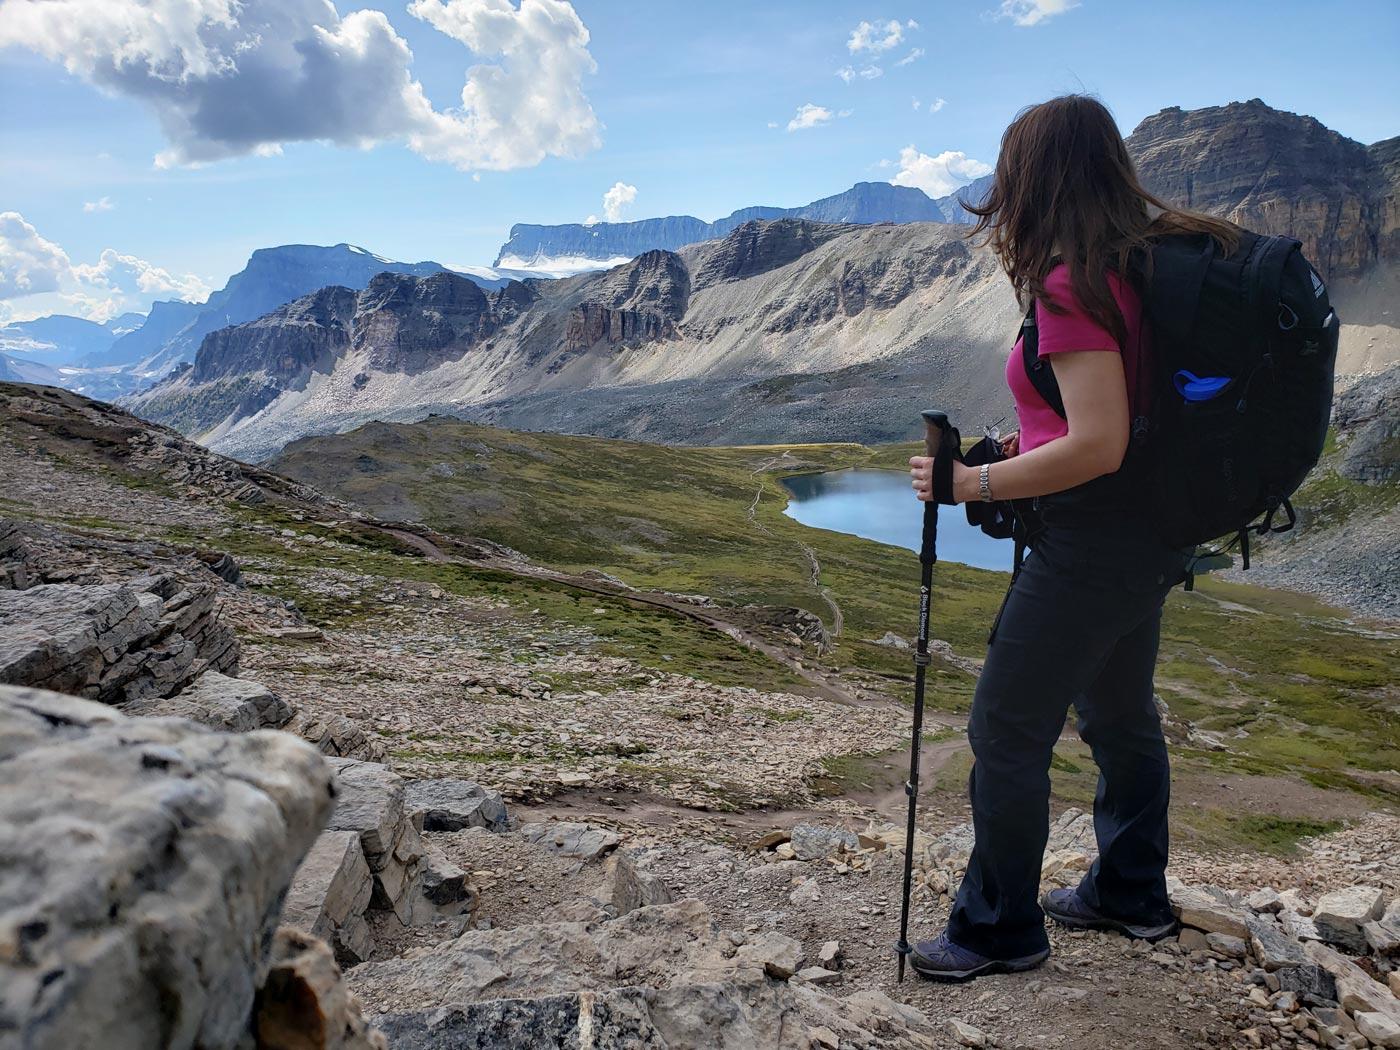 Jolene Rempel en route to Cirque Peak in Banff National Park, Alberta, Canada.